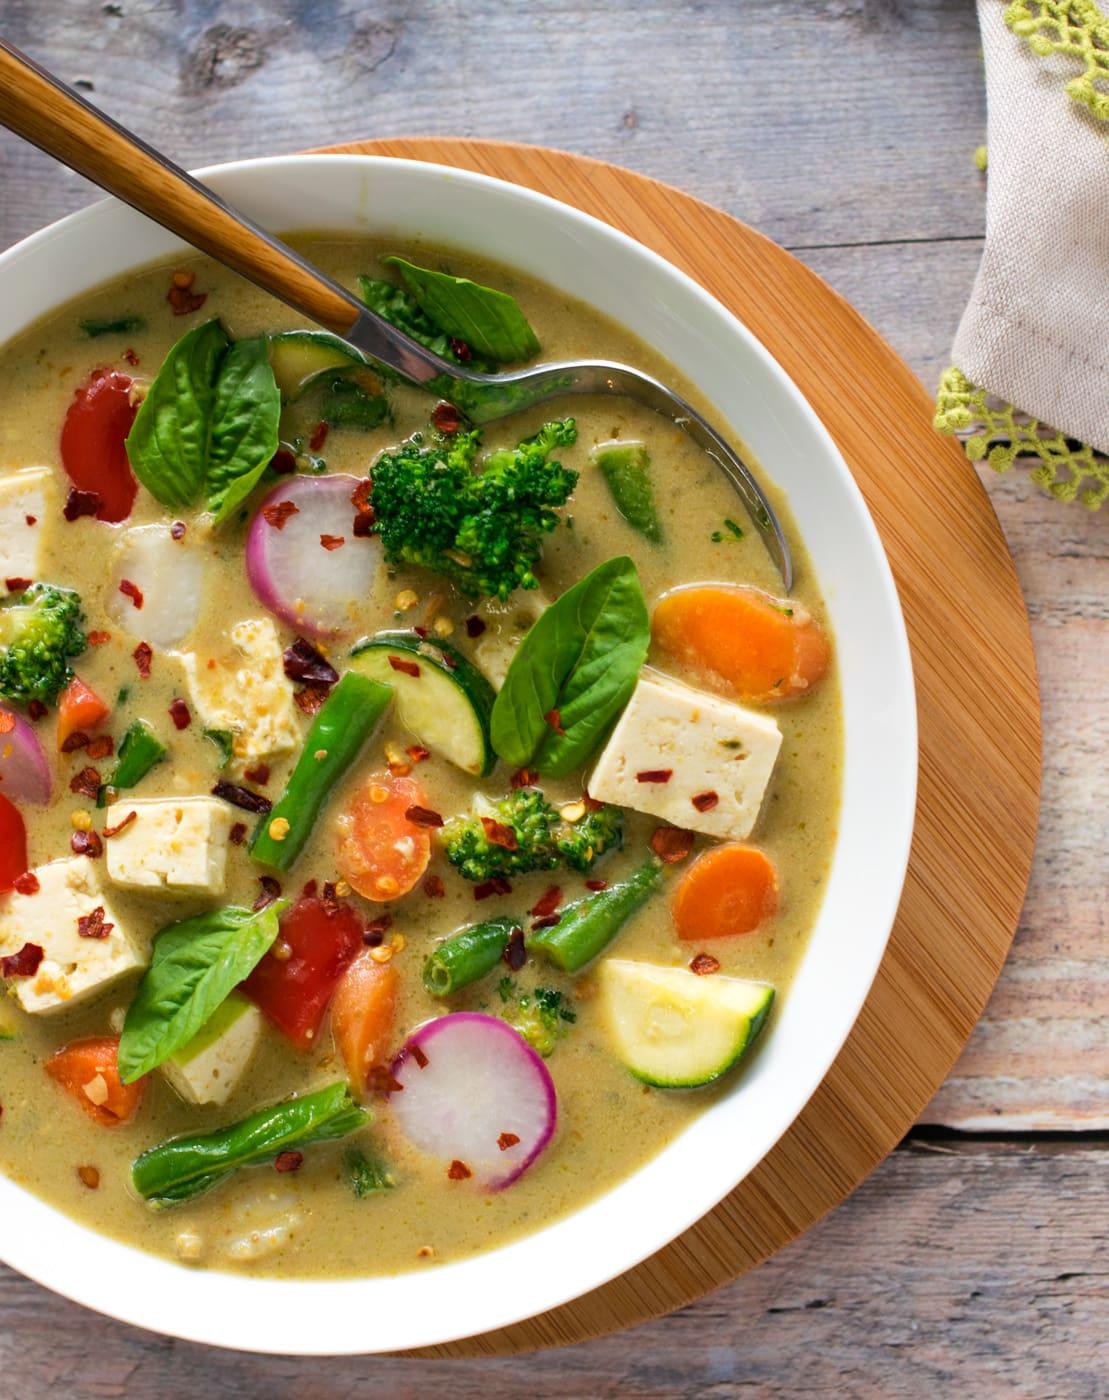 Almond milk vegetable curry (vegan + low carb)